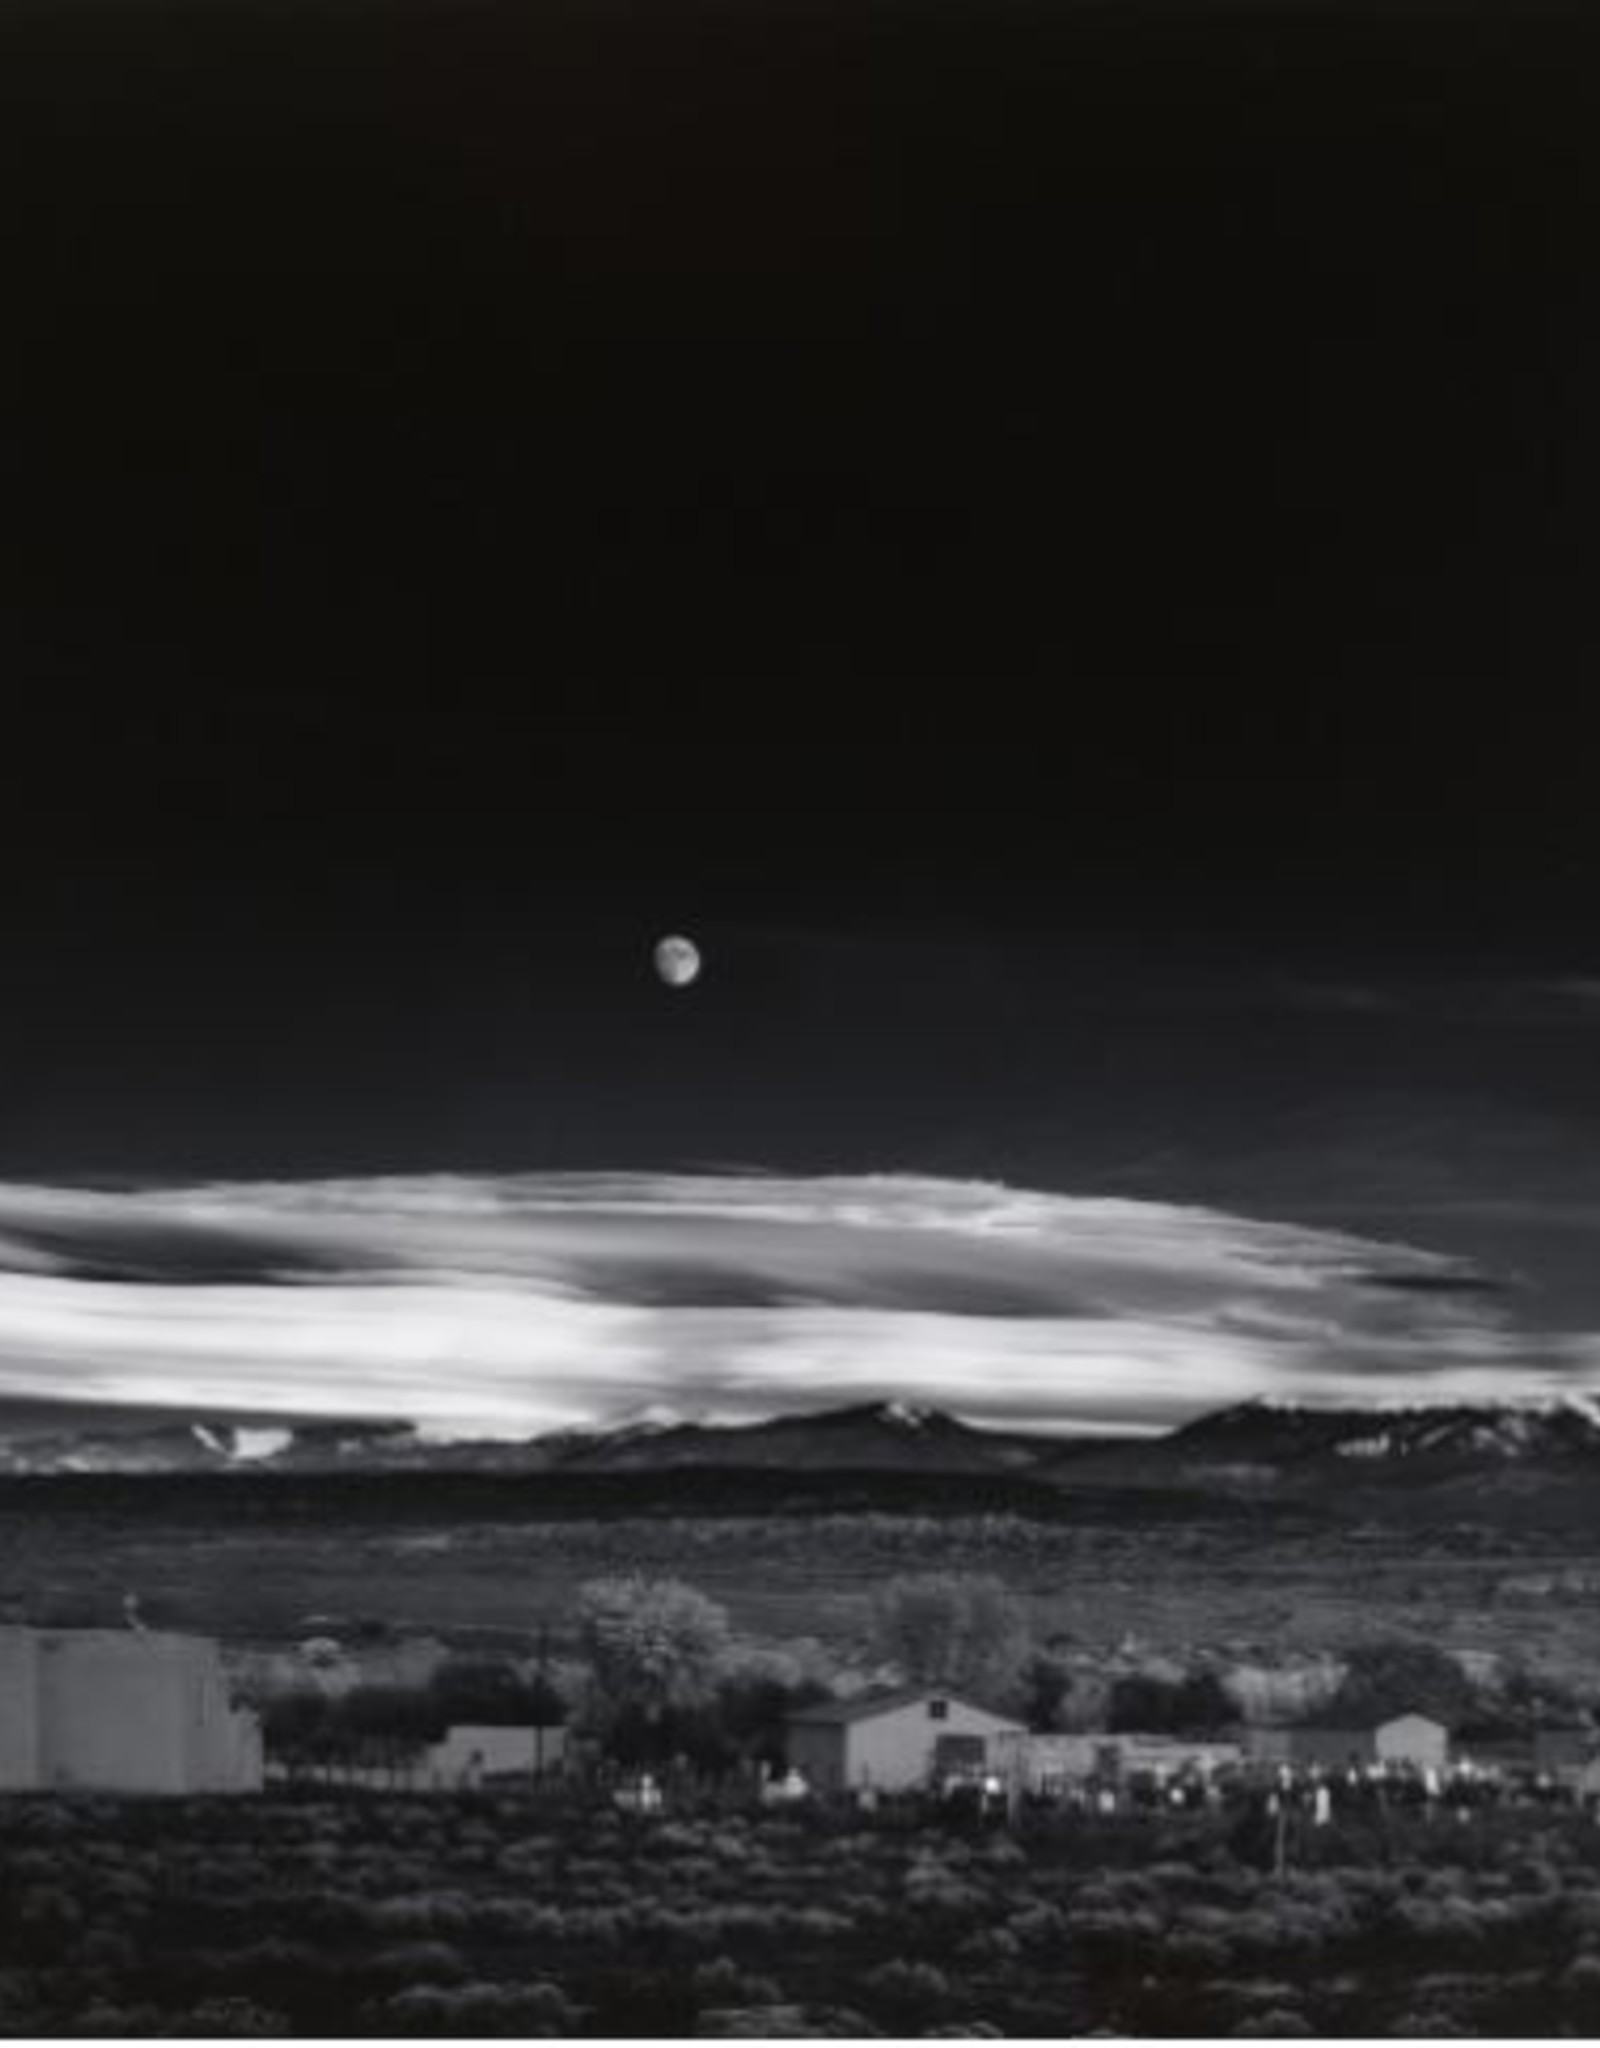 Ansel Adams Moonrise, Hernandez